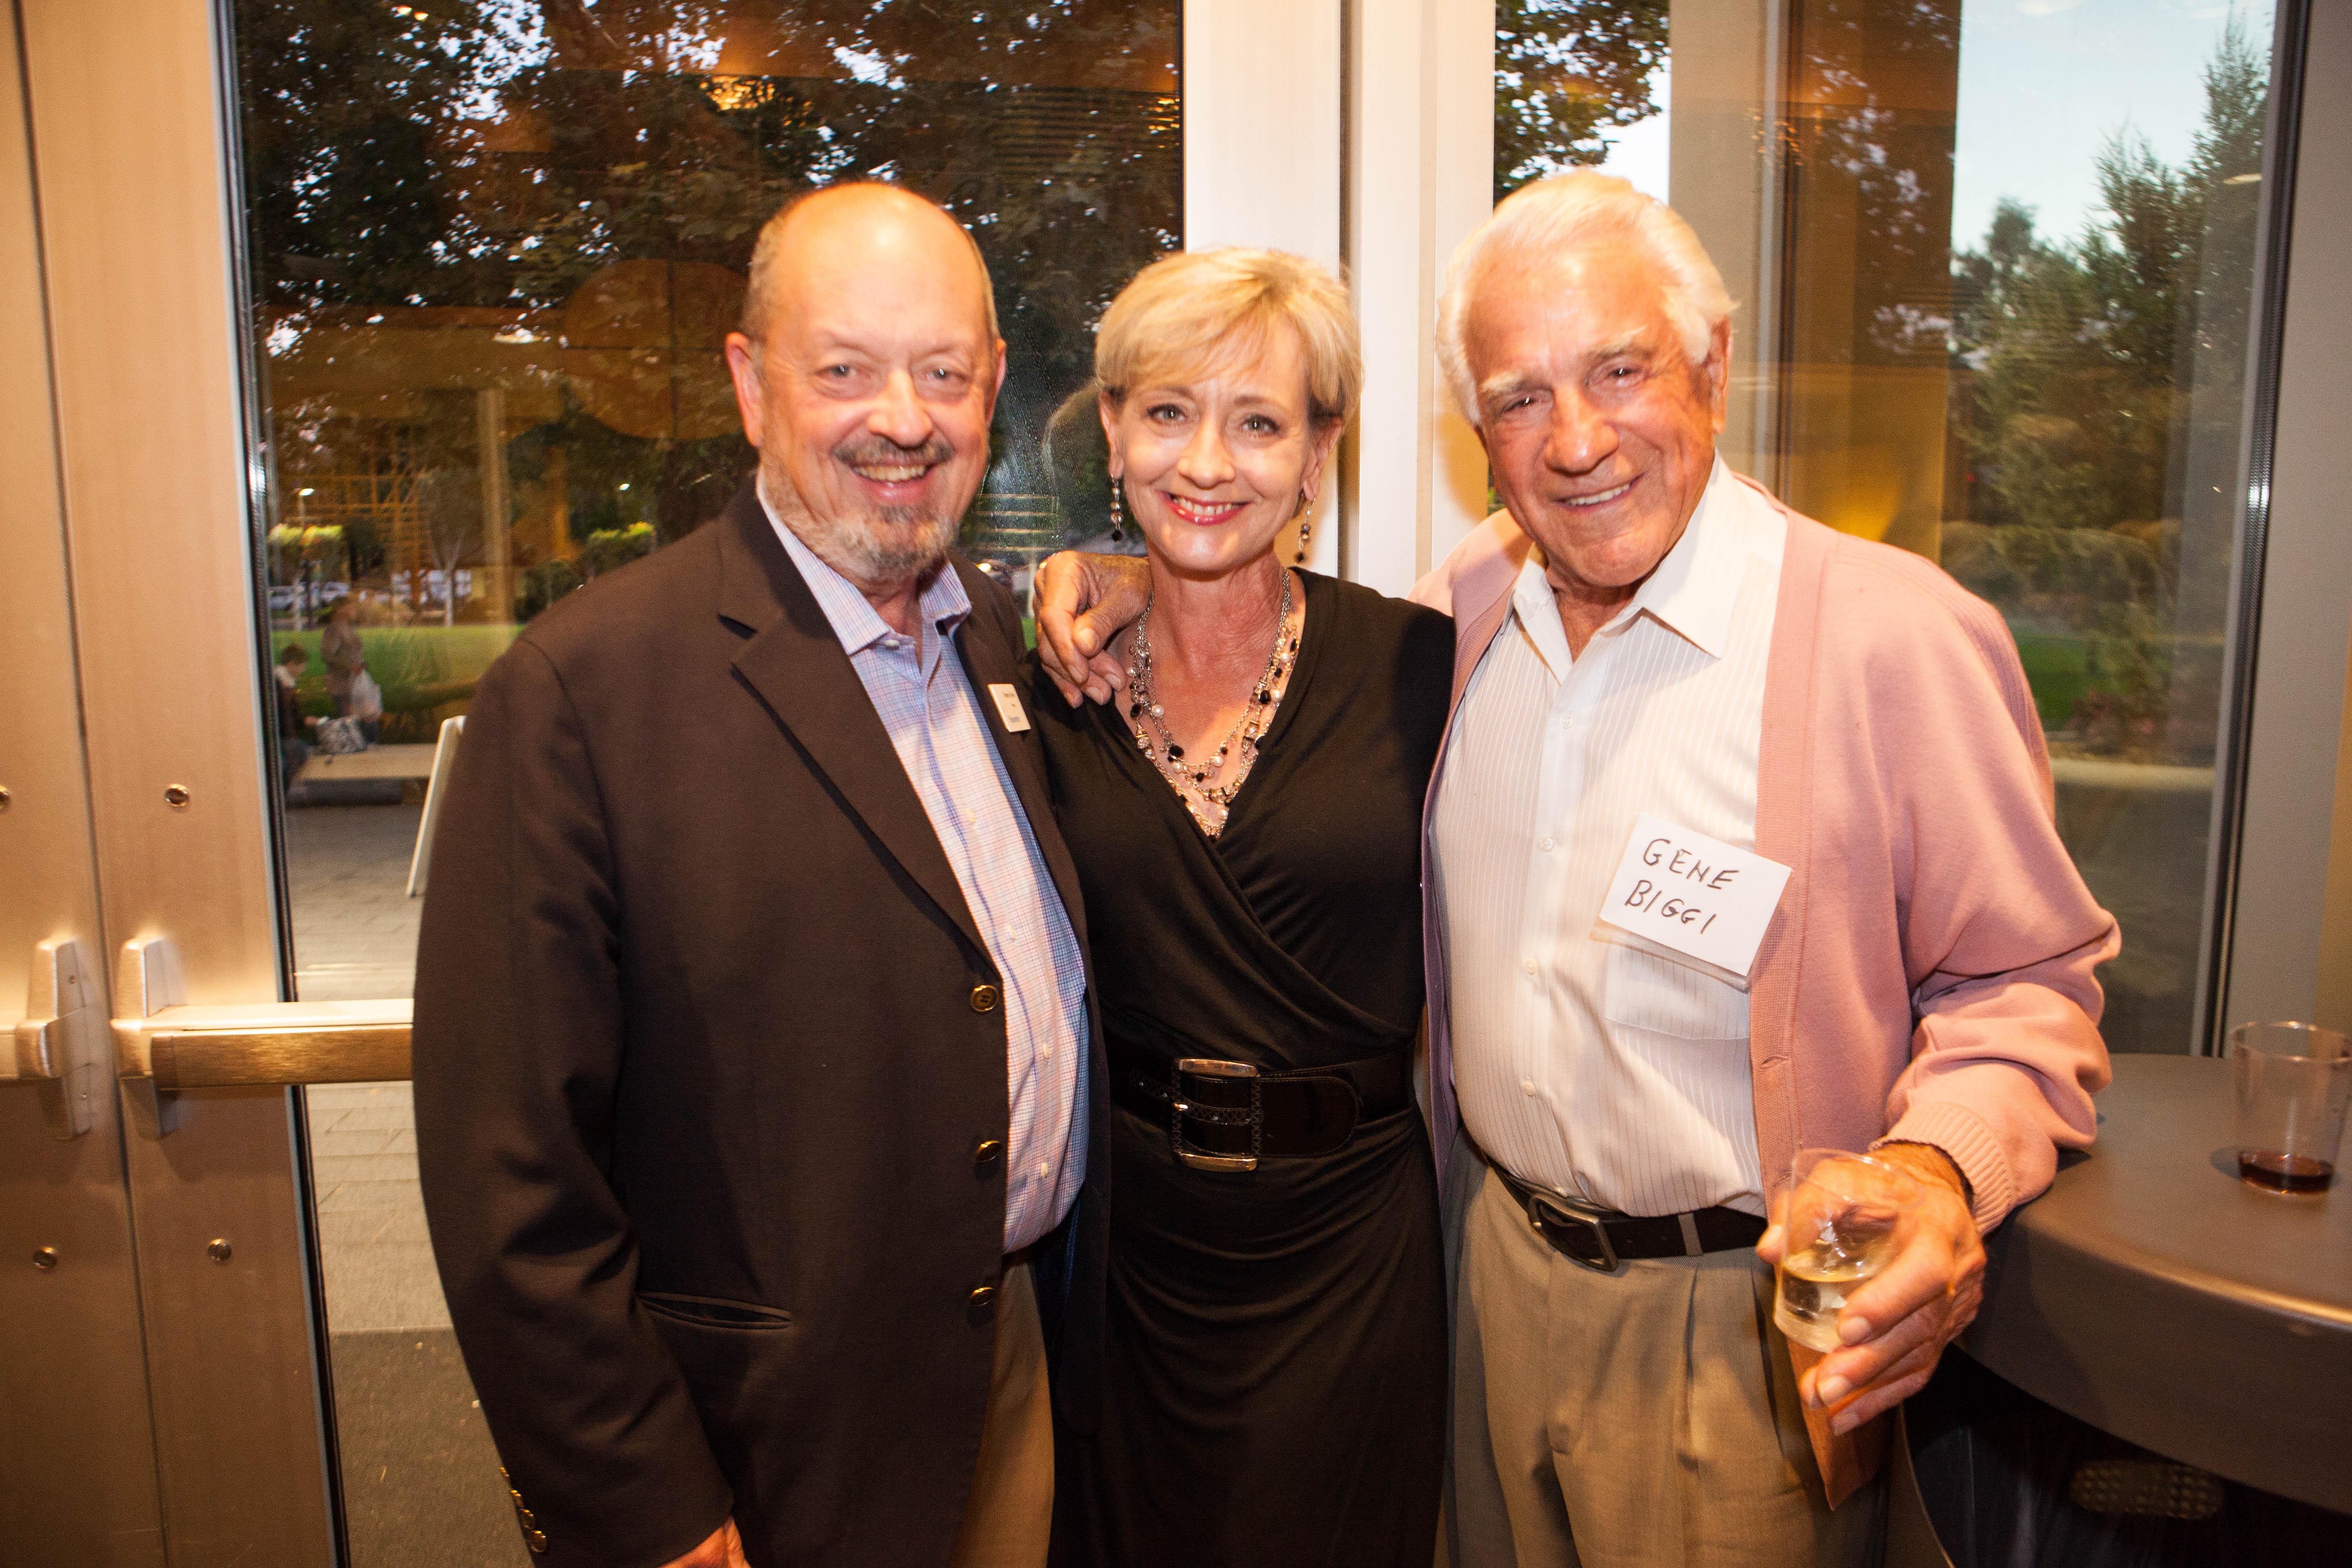 Mayor Denny Doyle & Gino Biggi, Beaverton Foods, Oct. 2014 Fundraising on a Mission Clarinda Hanson